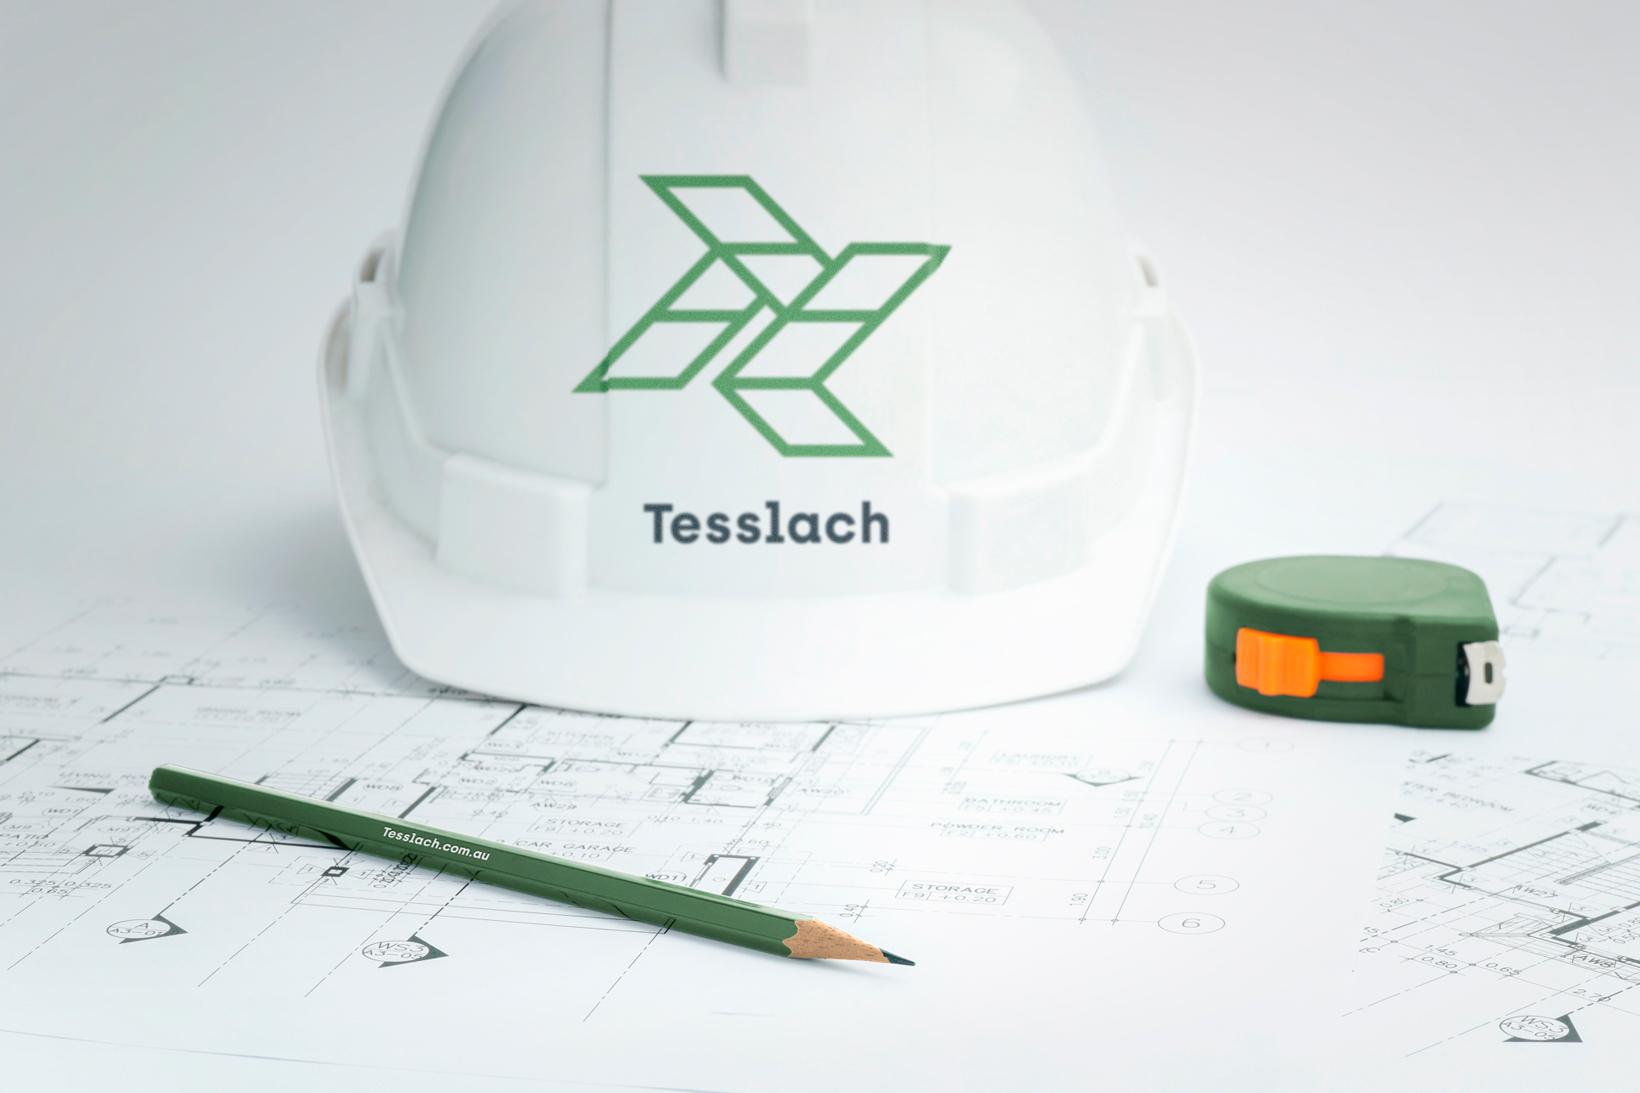 Tesslach branding identidad corporativa diseño gráfico Vibranding